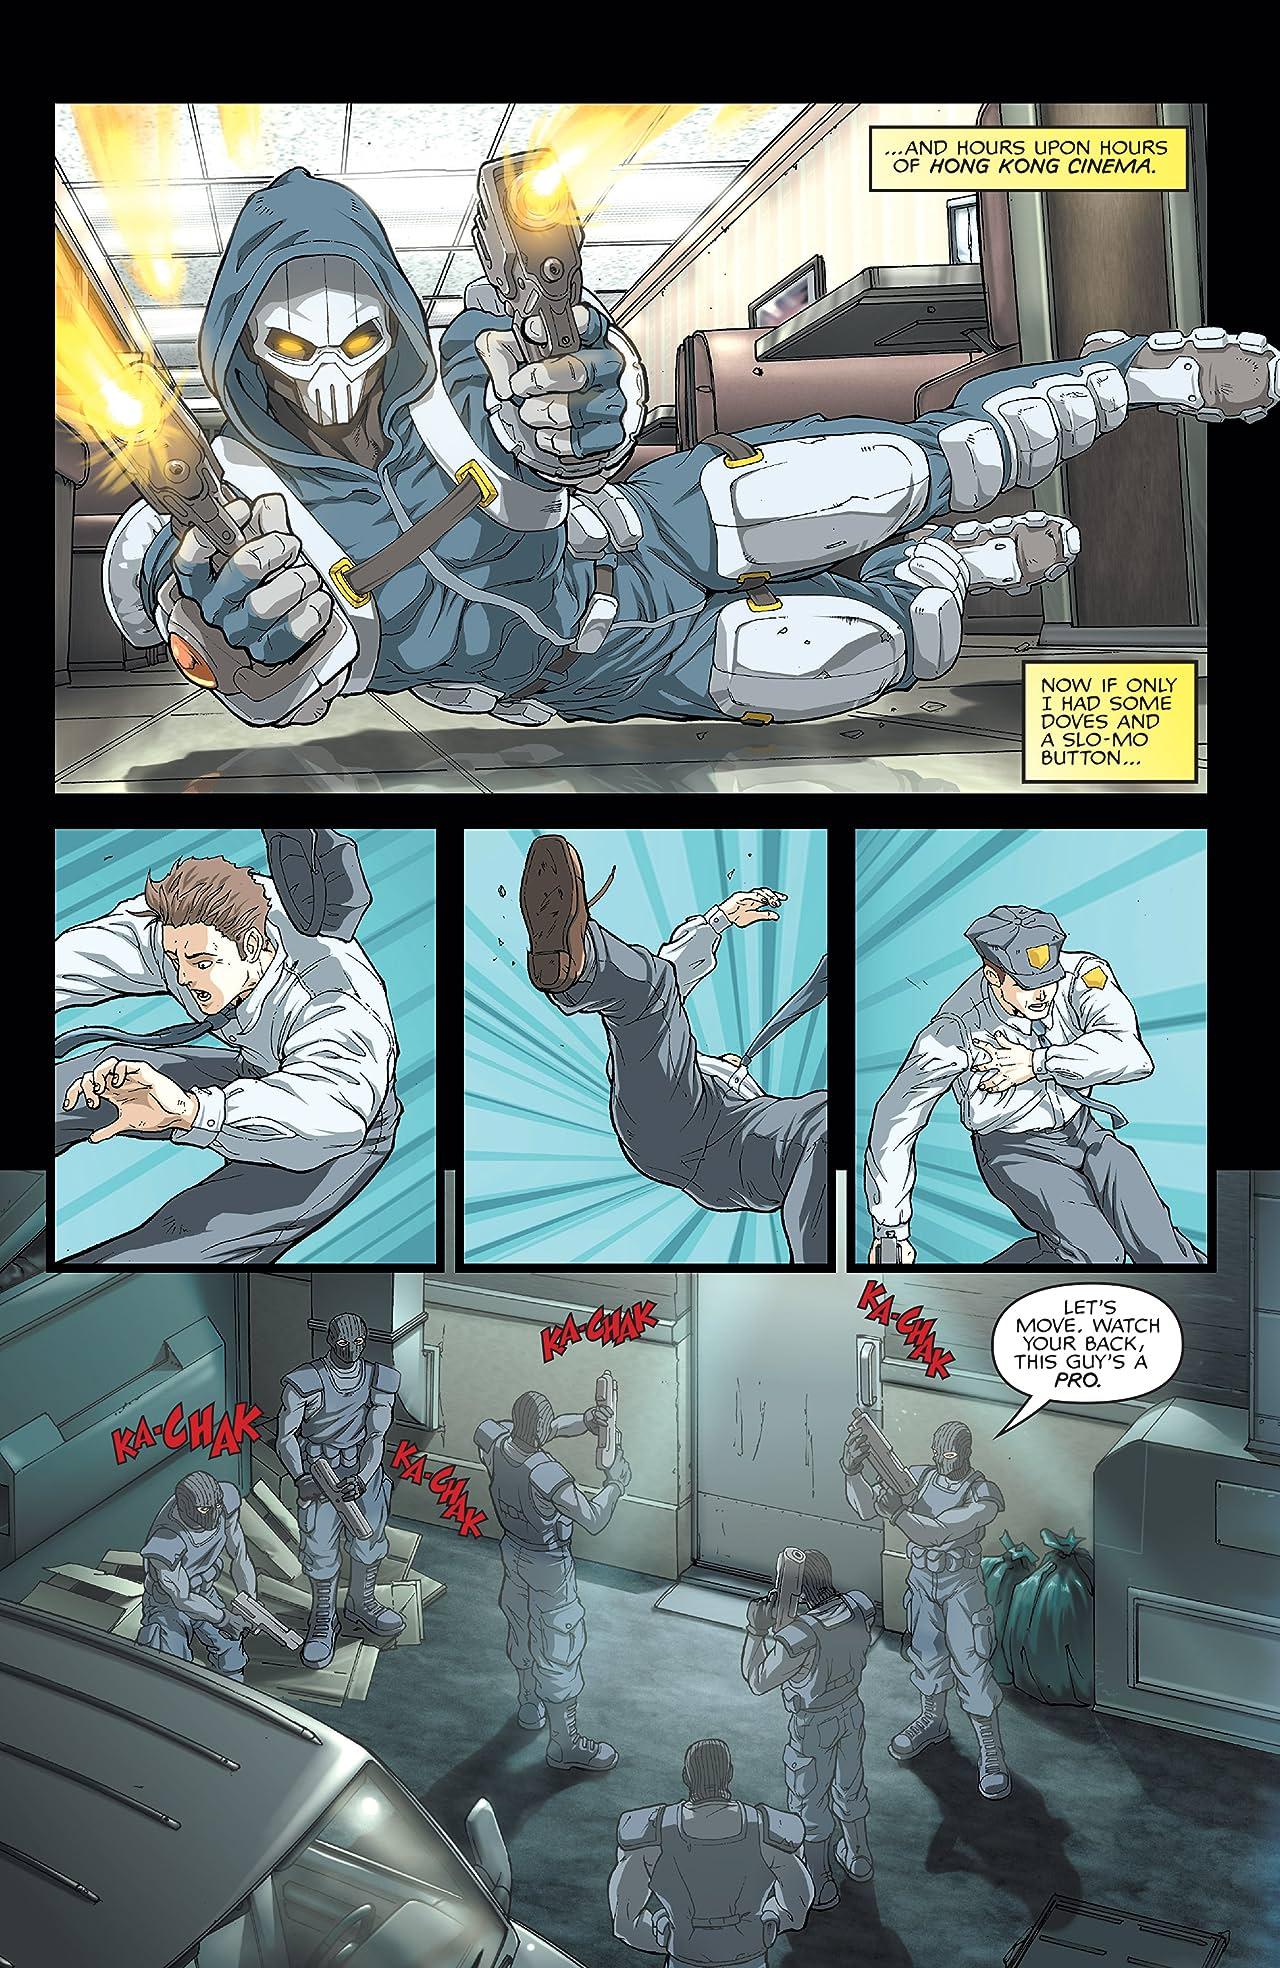 Taskmaster (2002) #2 (of 4)